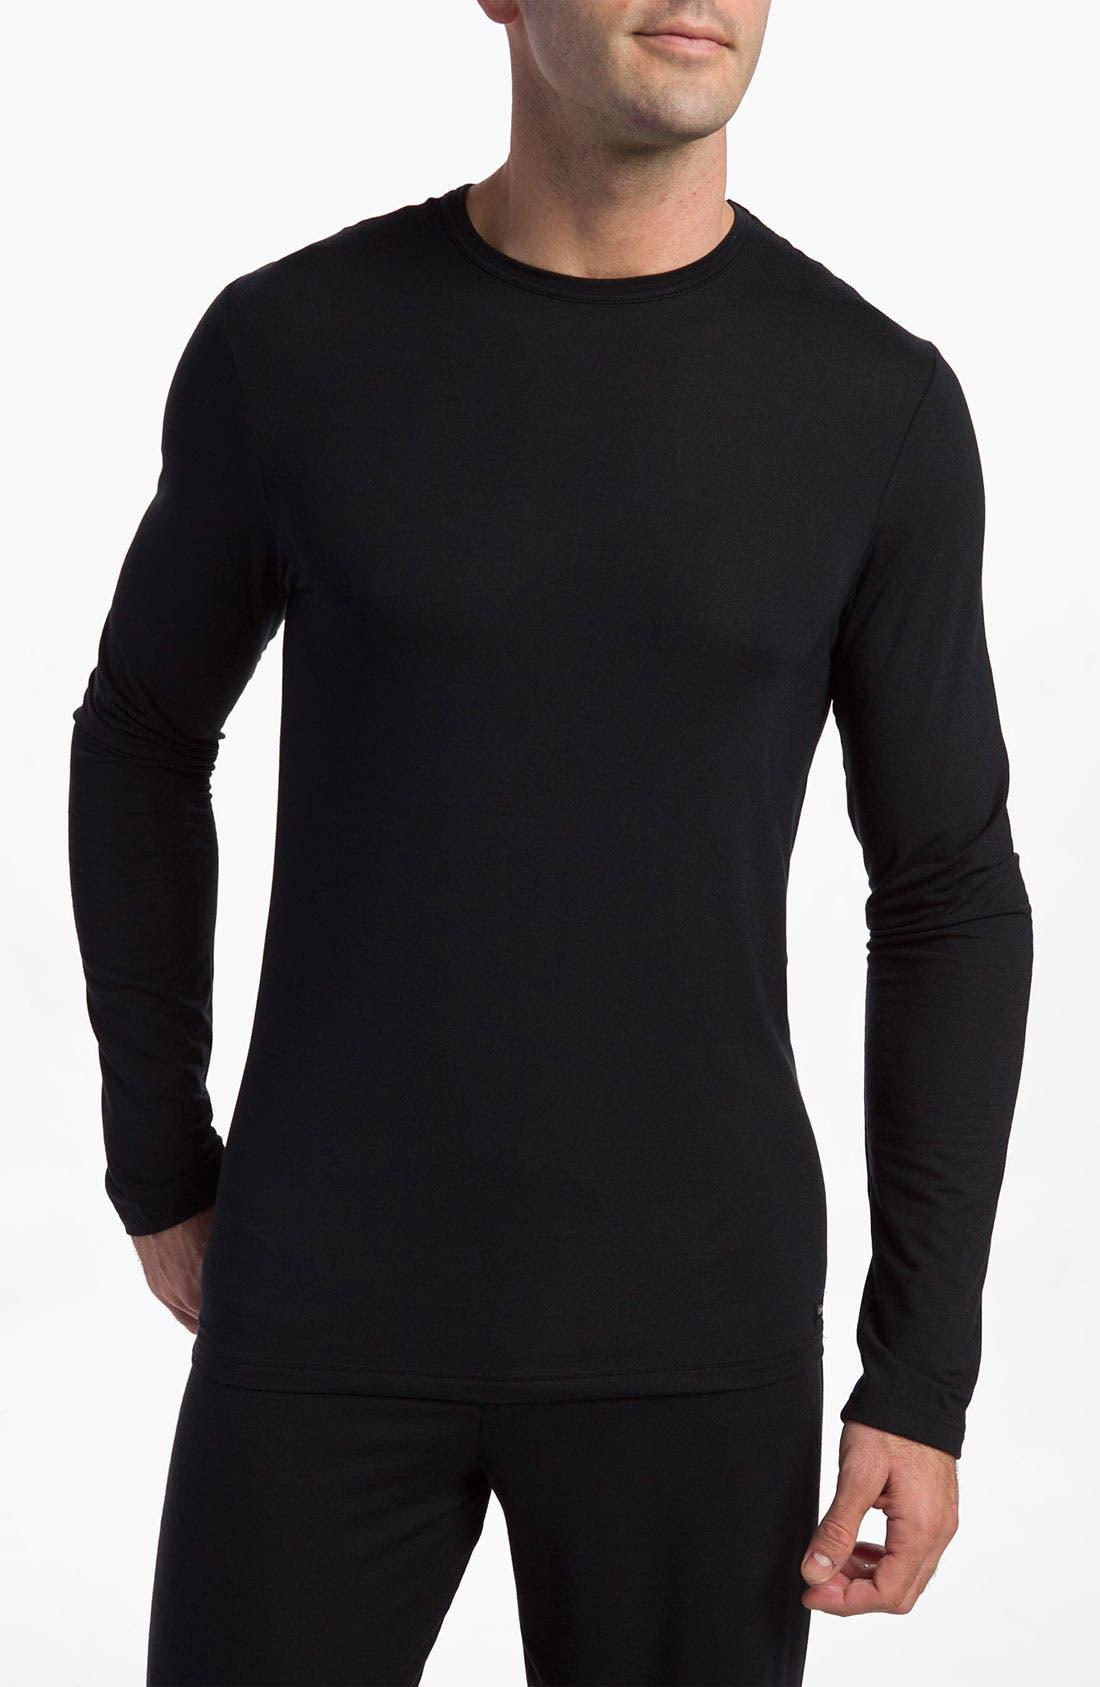 CALVIN KLEIN U1139 Micromodal Long Sleeve T-Shirt